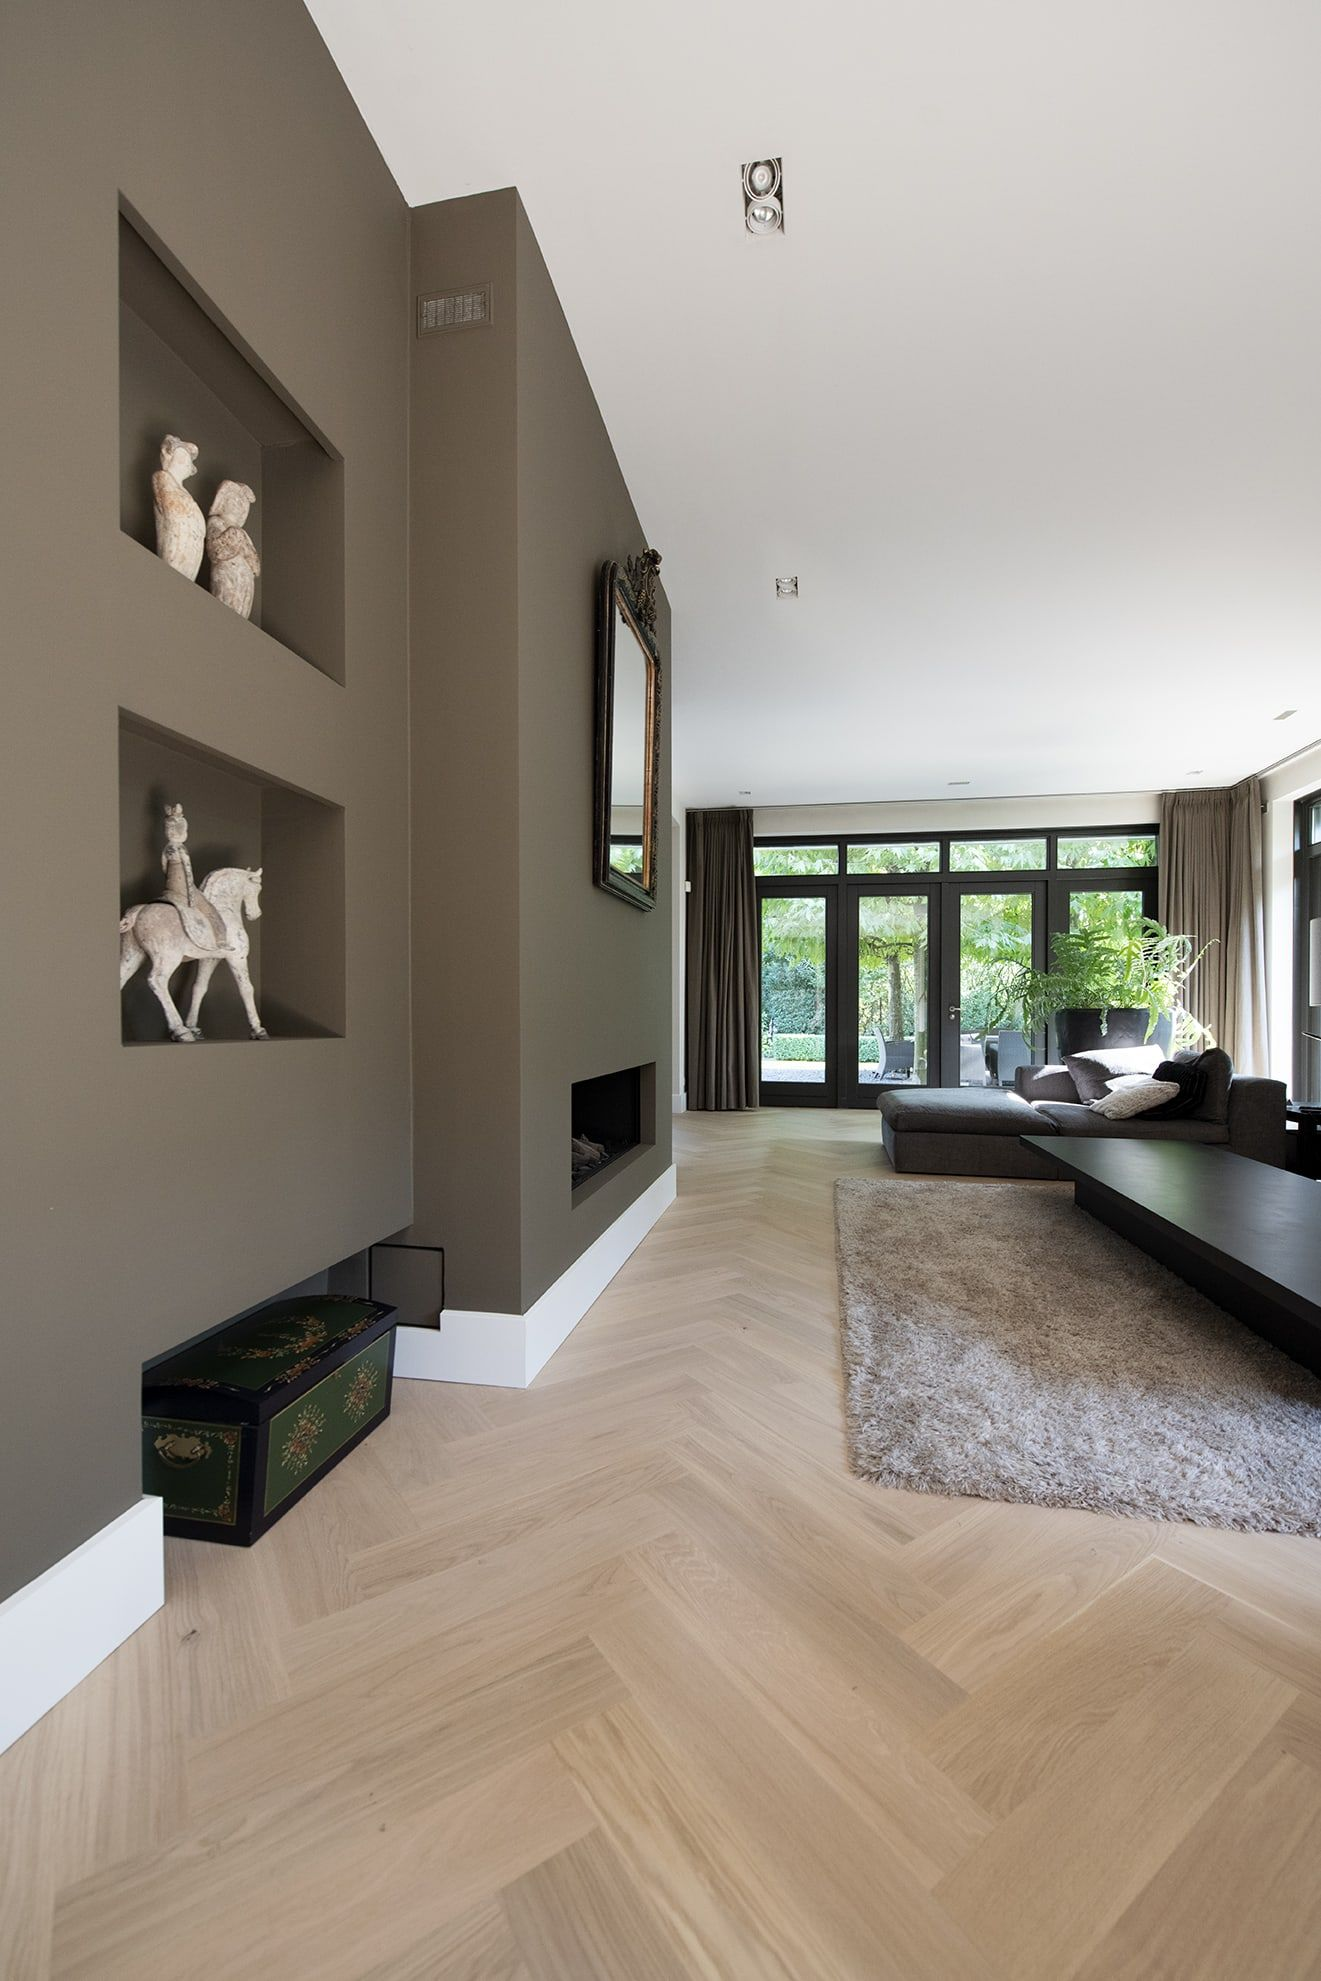 Bauwerk Crema Visgraat in warm en sfeervol interieur | Tida Parket Tilburg